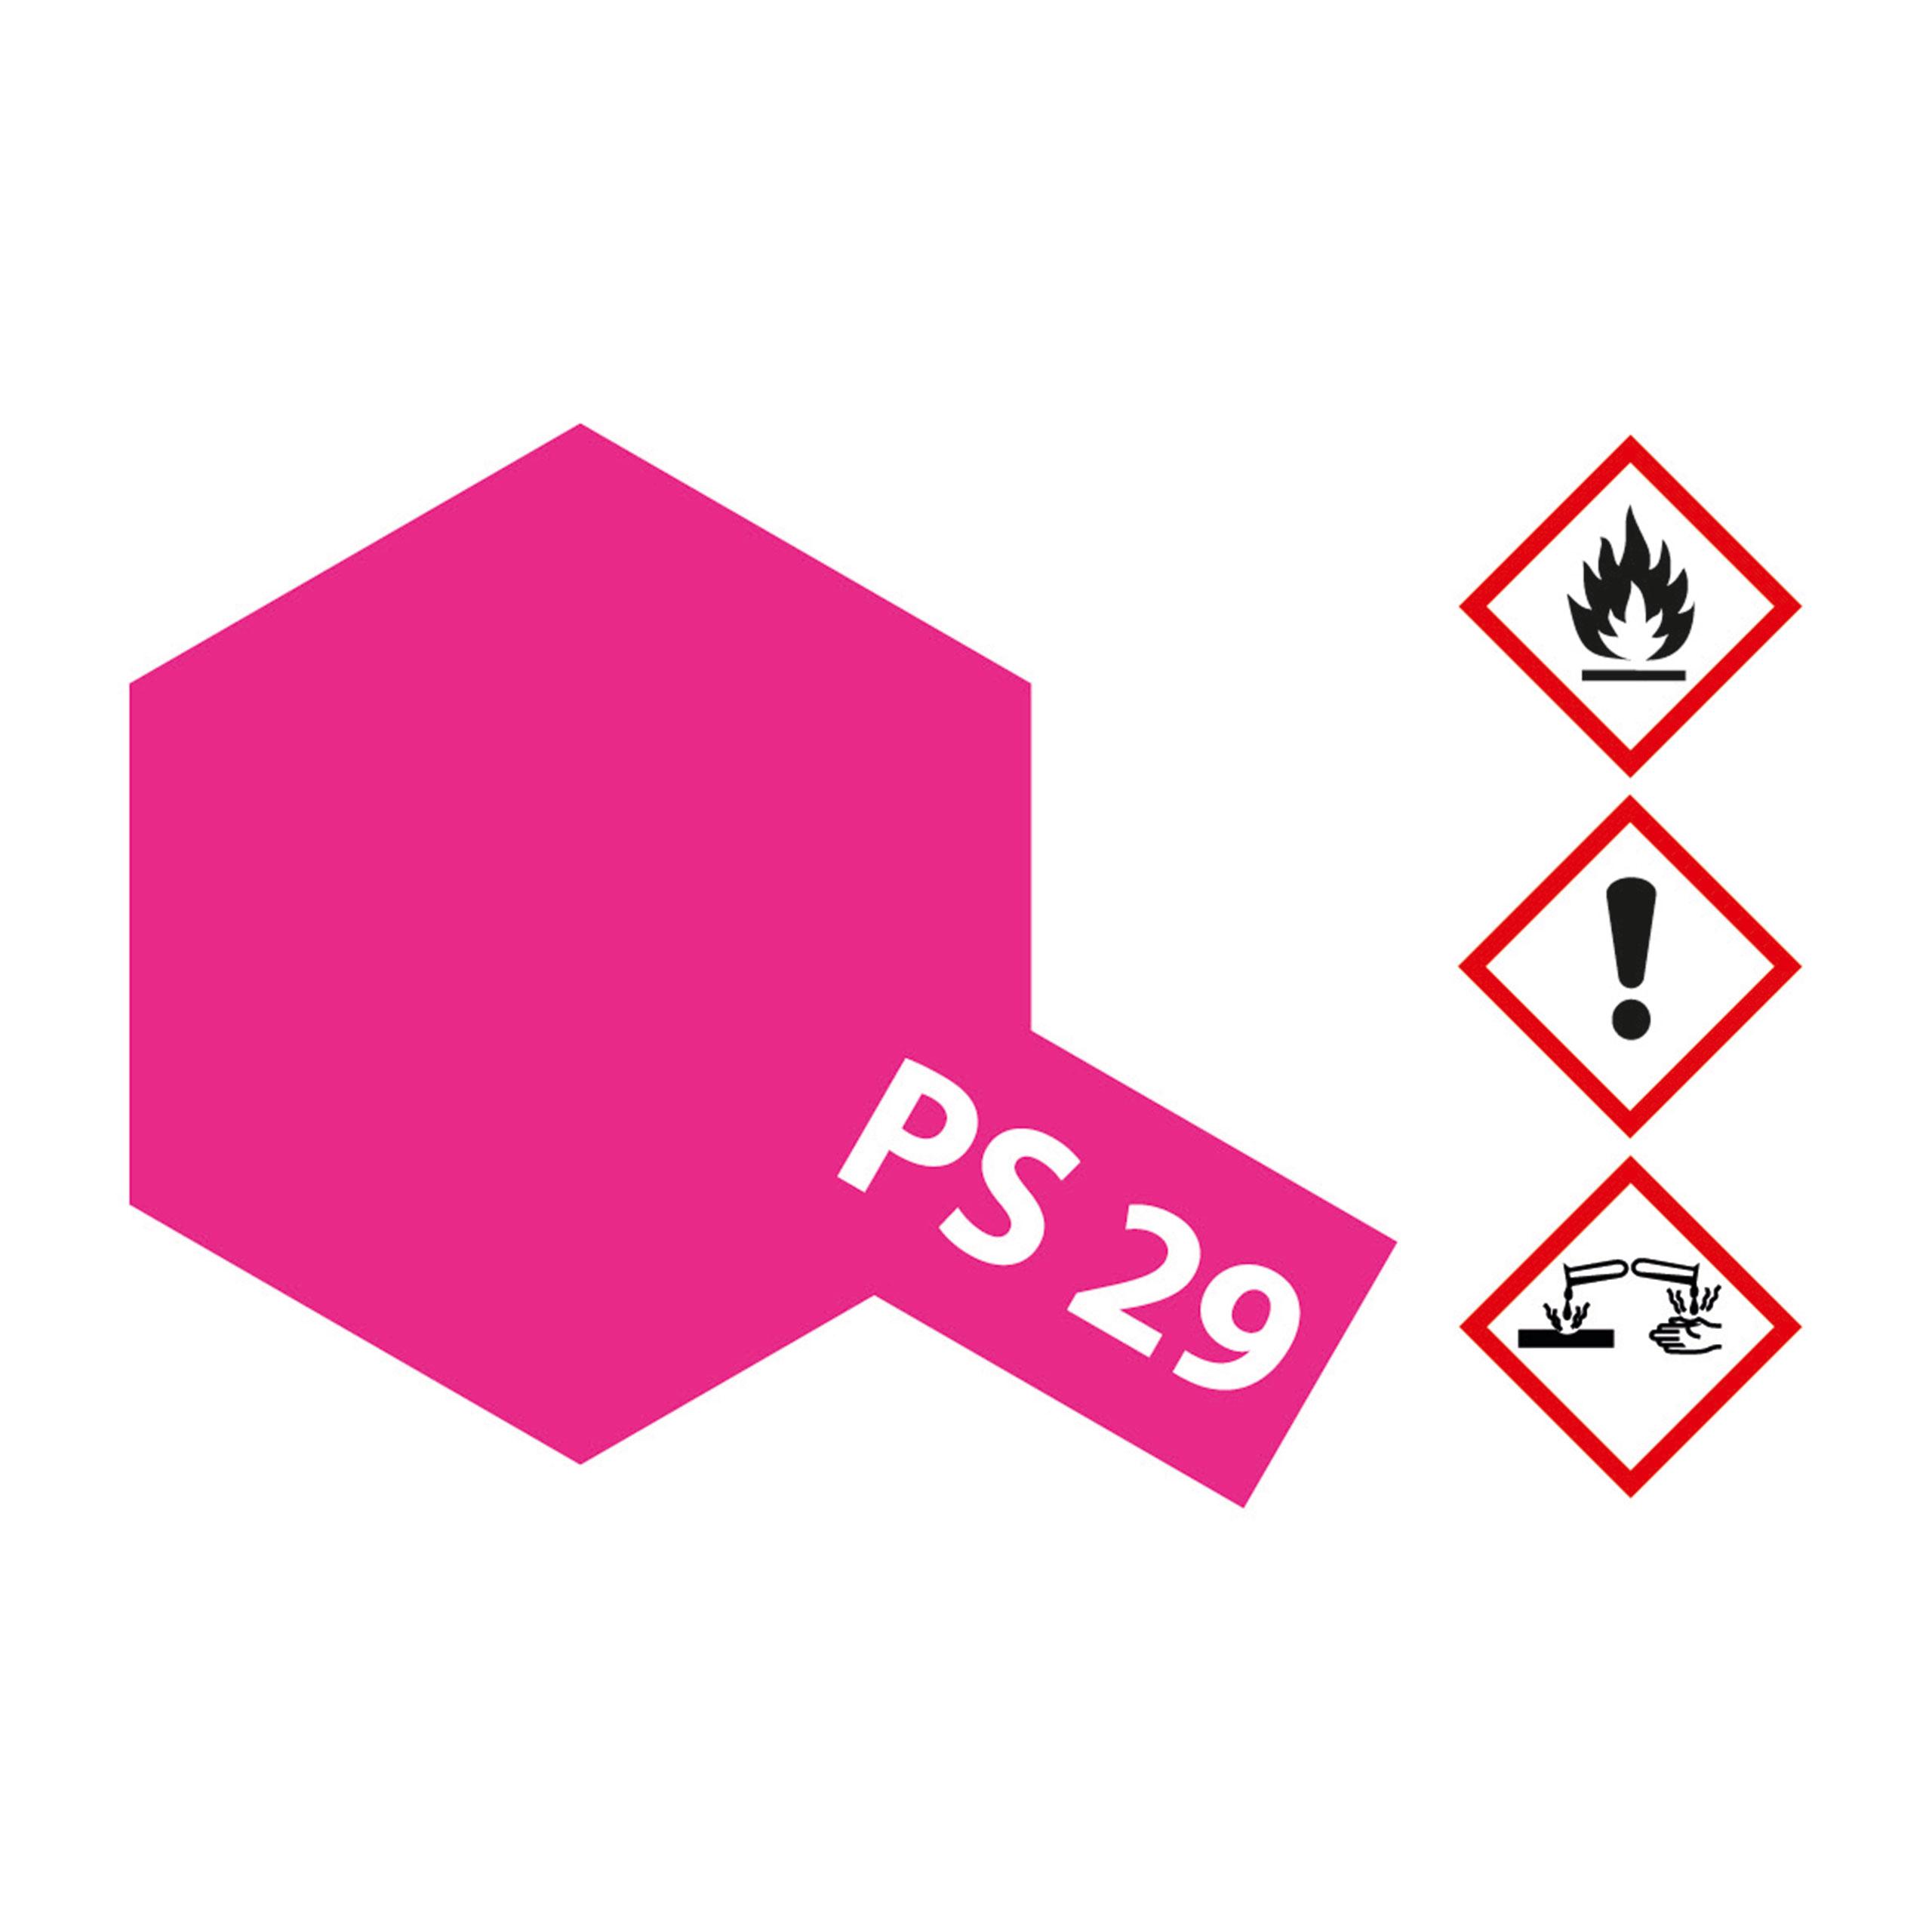 PS-29 Neon Rosarot Polycarb. - 100ml Sprayfarbe Lexan - Tamiya 300086029